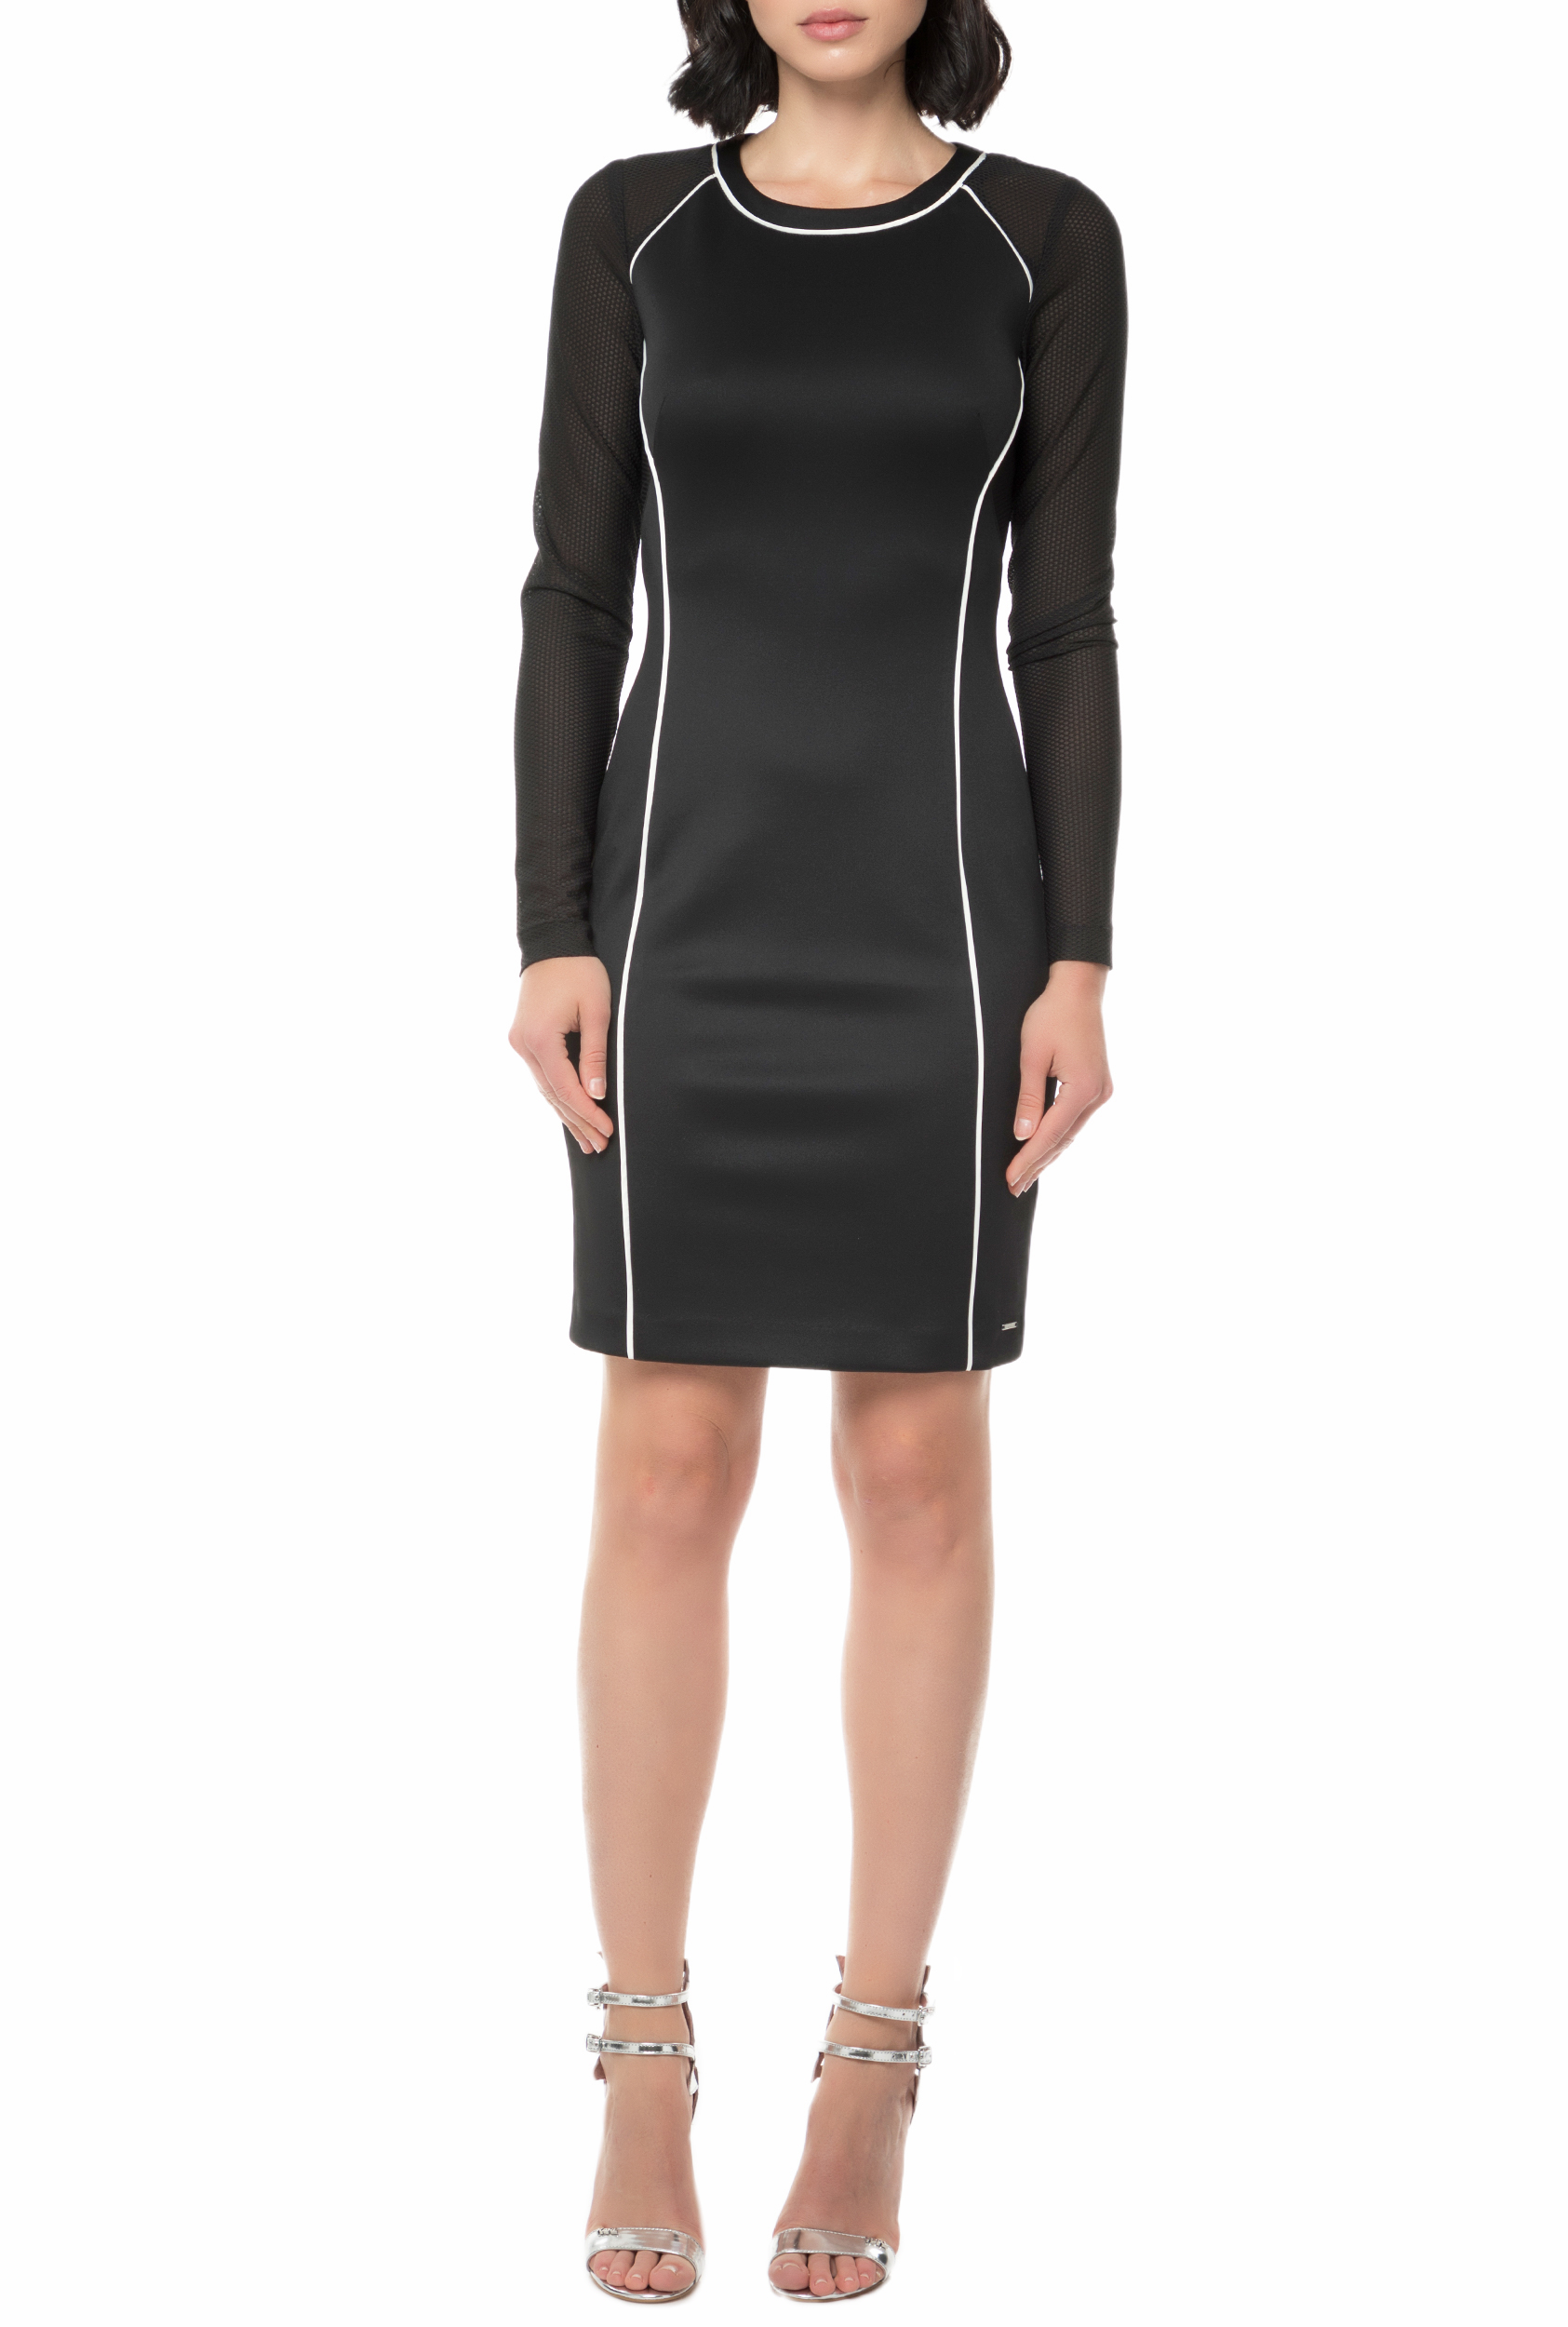 CALVIN KLEIN JEANS - Γυναικείο μίνι φόρεμα CALVIN KLEIN JEANS DEVYN μαύρο γυναικεία ρούχα φορέματα μίνι